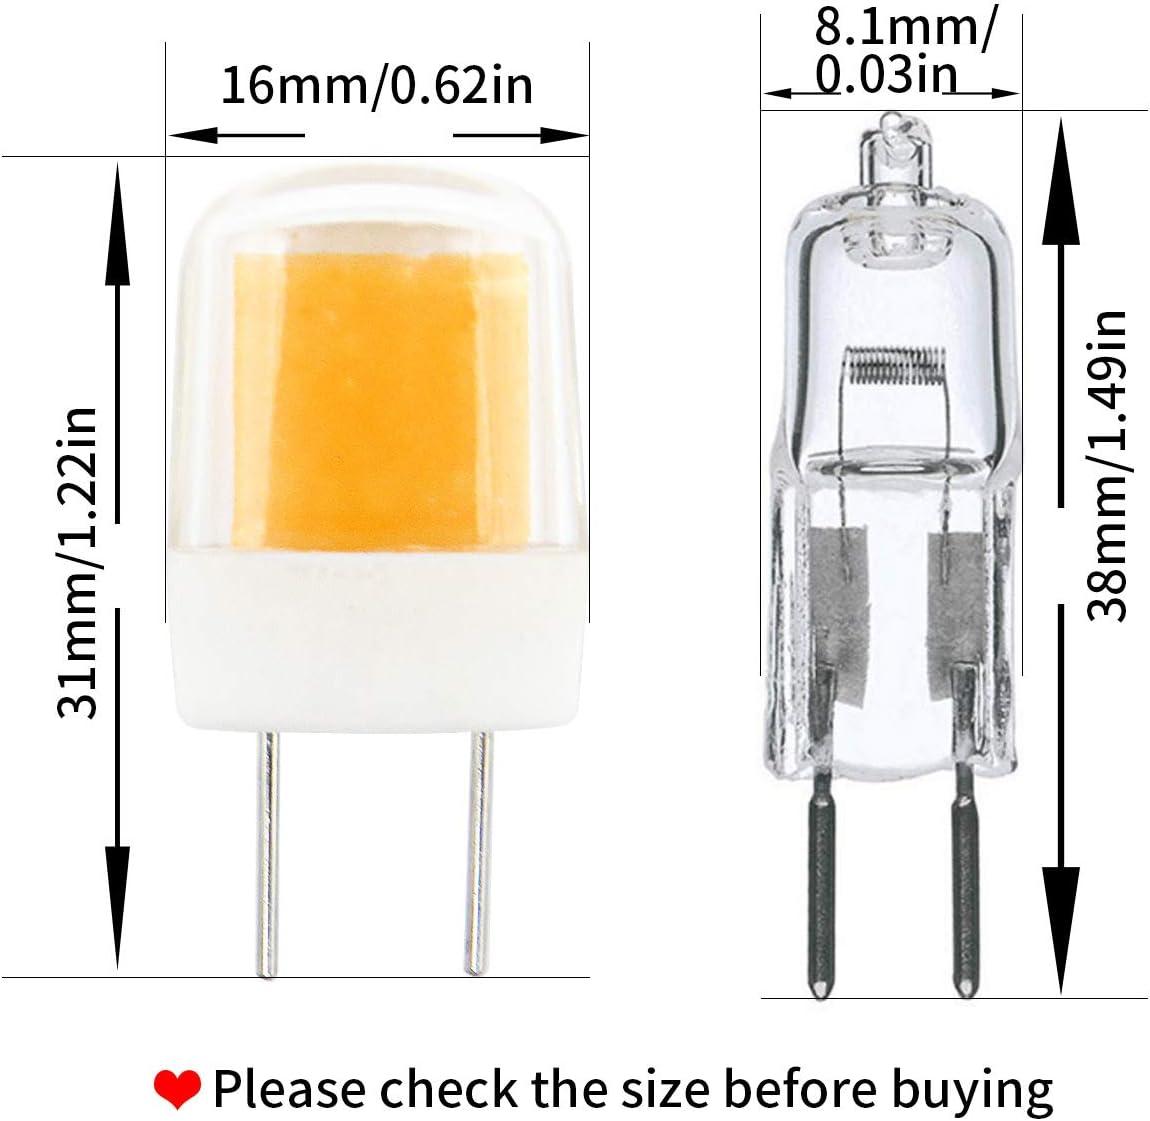 3W 300 Lumen AC 120V G8 LED Bulb 10-Pack Dimmable G8//GY8.6 Bi-Pin Base Light Bulbs G8 Bulbs for Under Cabinet Counter Light 25W Equivalent 3000K Warm White